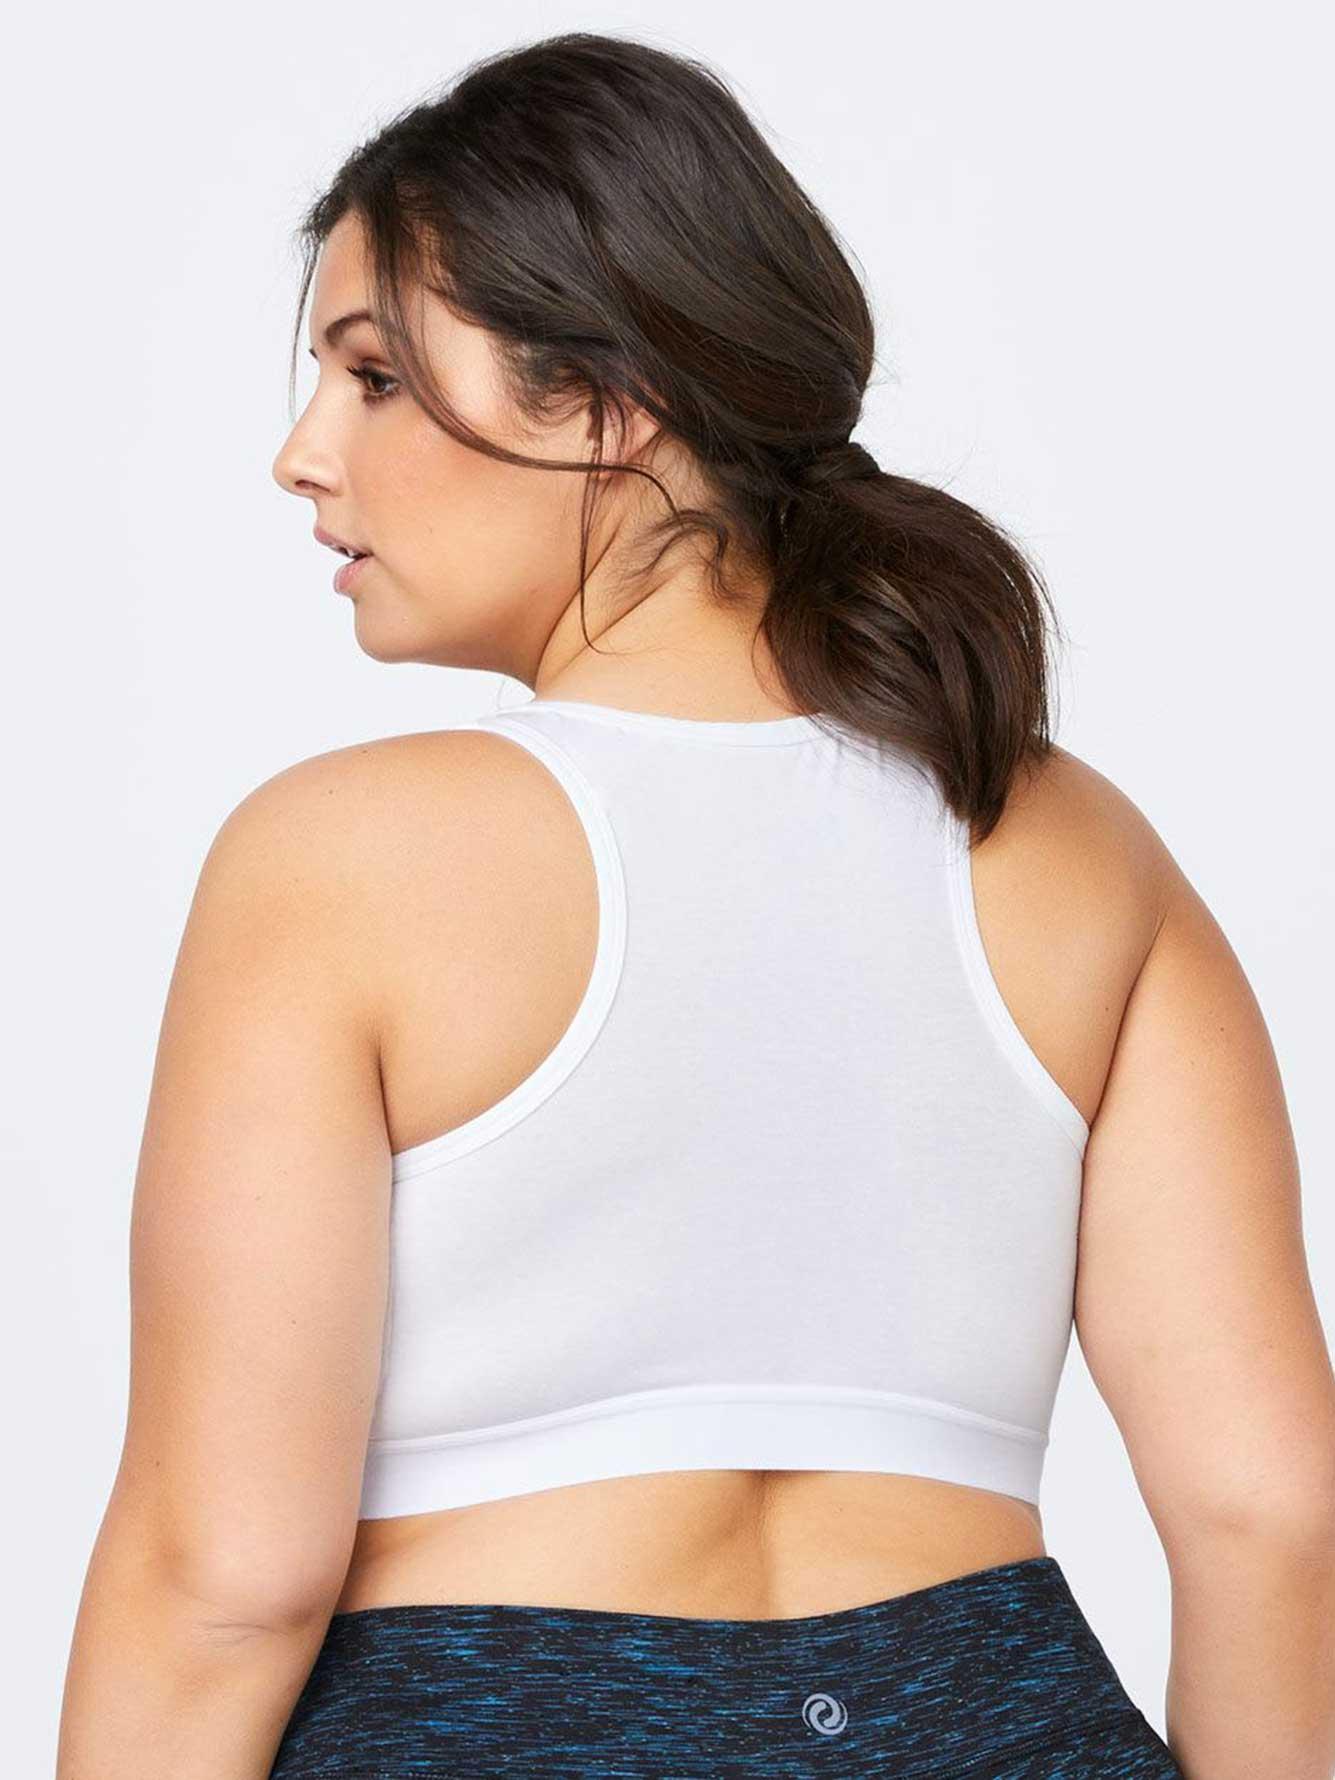 875ecb65e26 Addition Elle Cotton Plus-size Bralette With Mesh - Activezone in ...